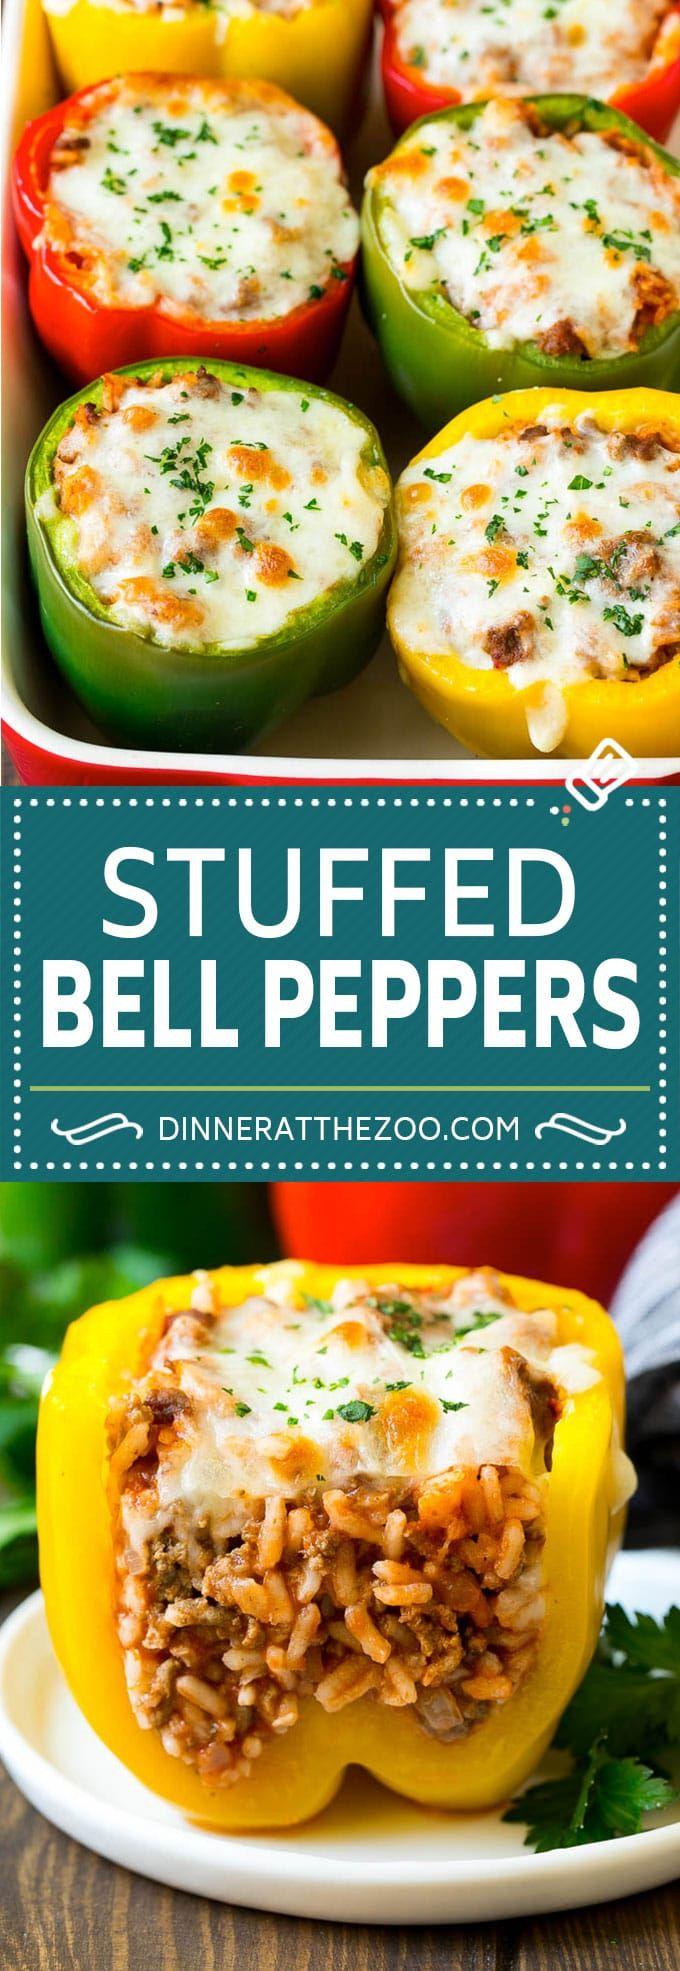 Stuffed Bell Peppers Recipe | Stuffed Peppers